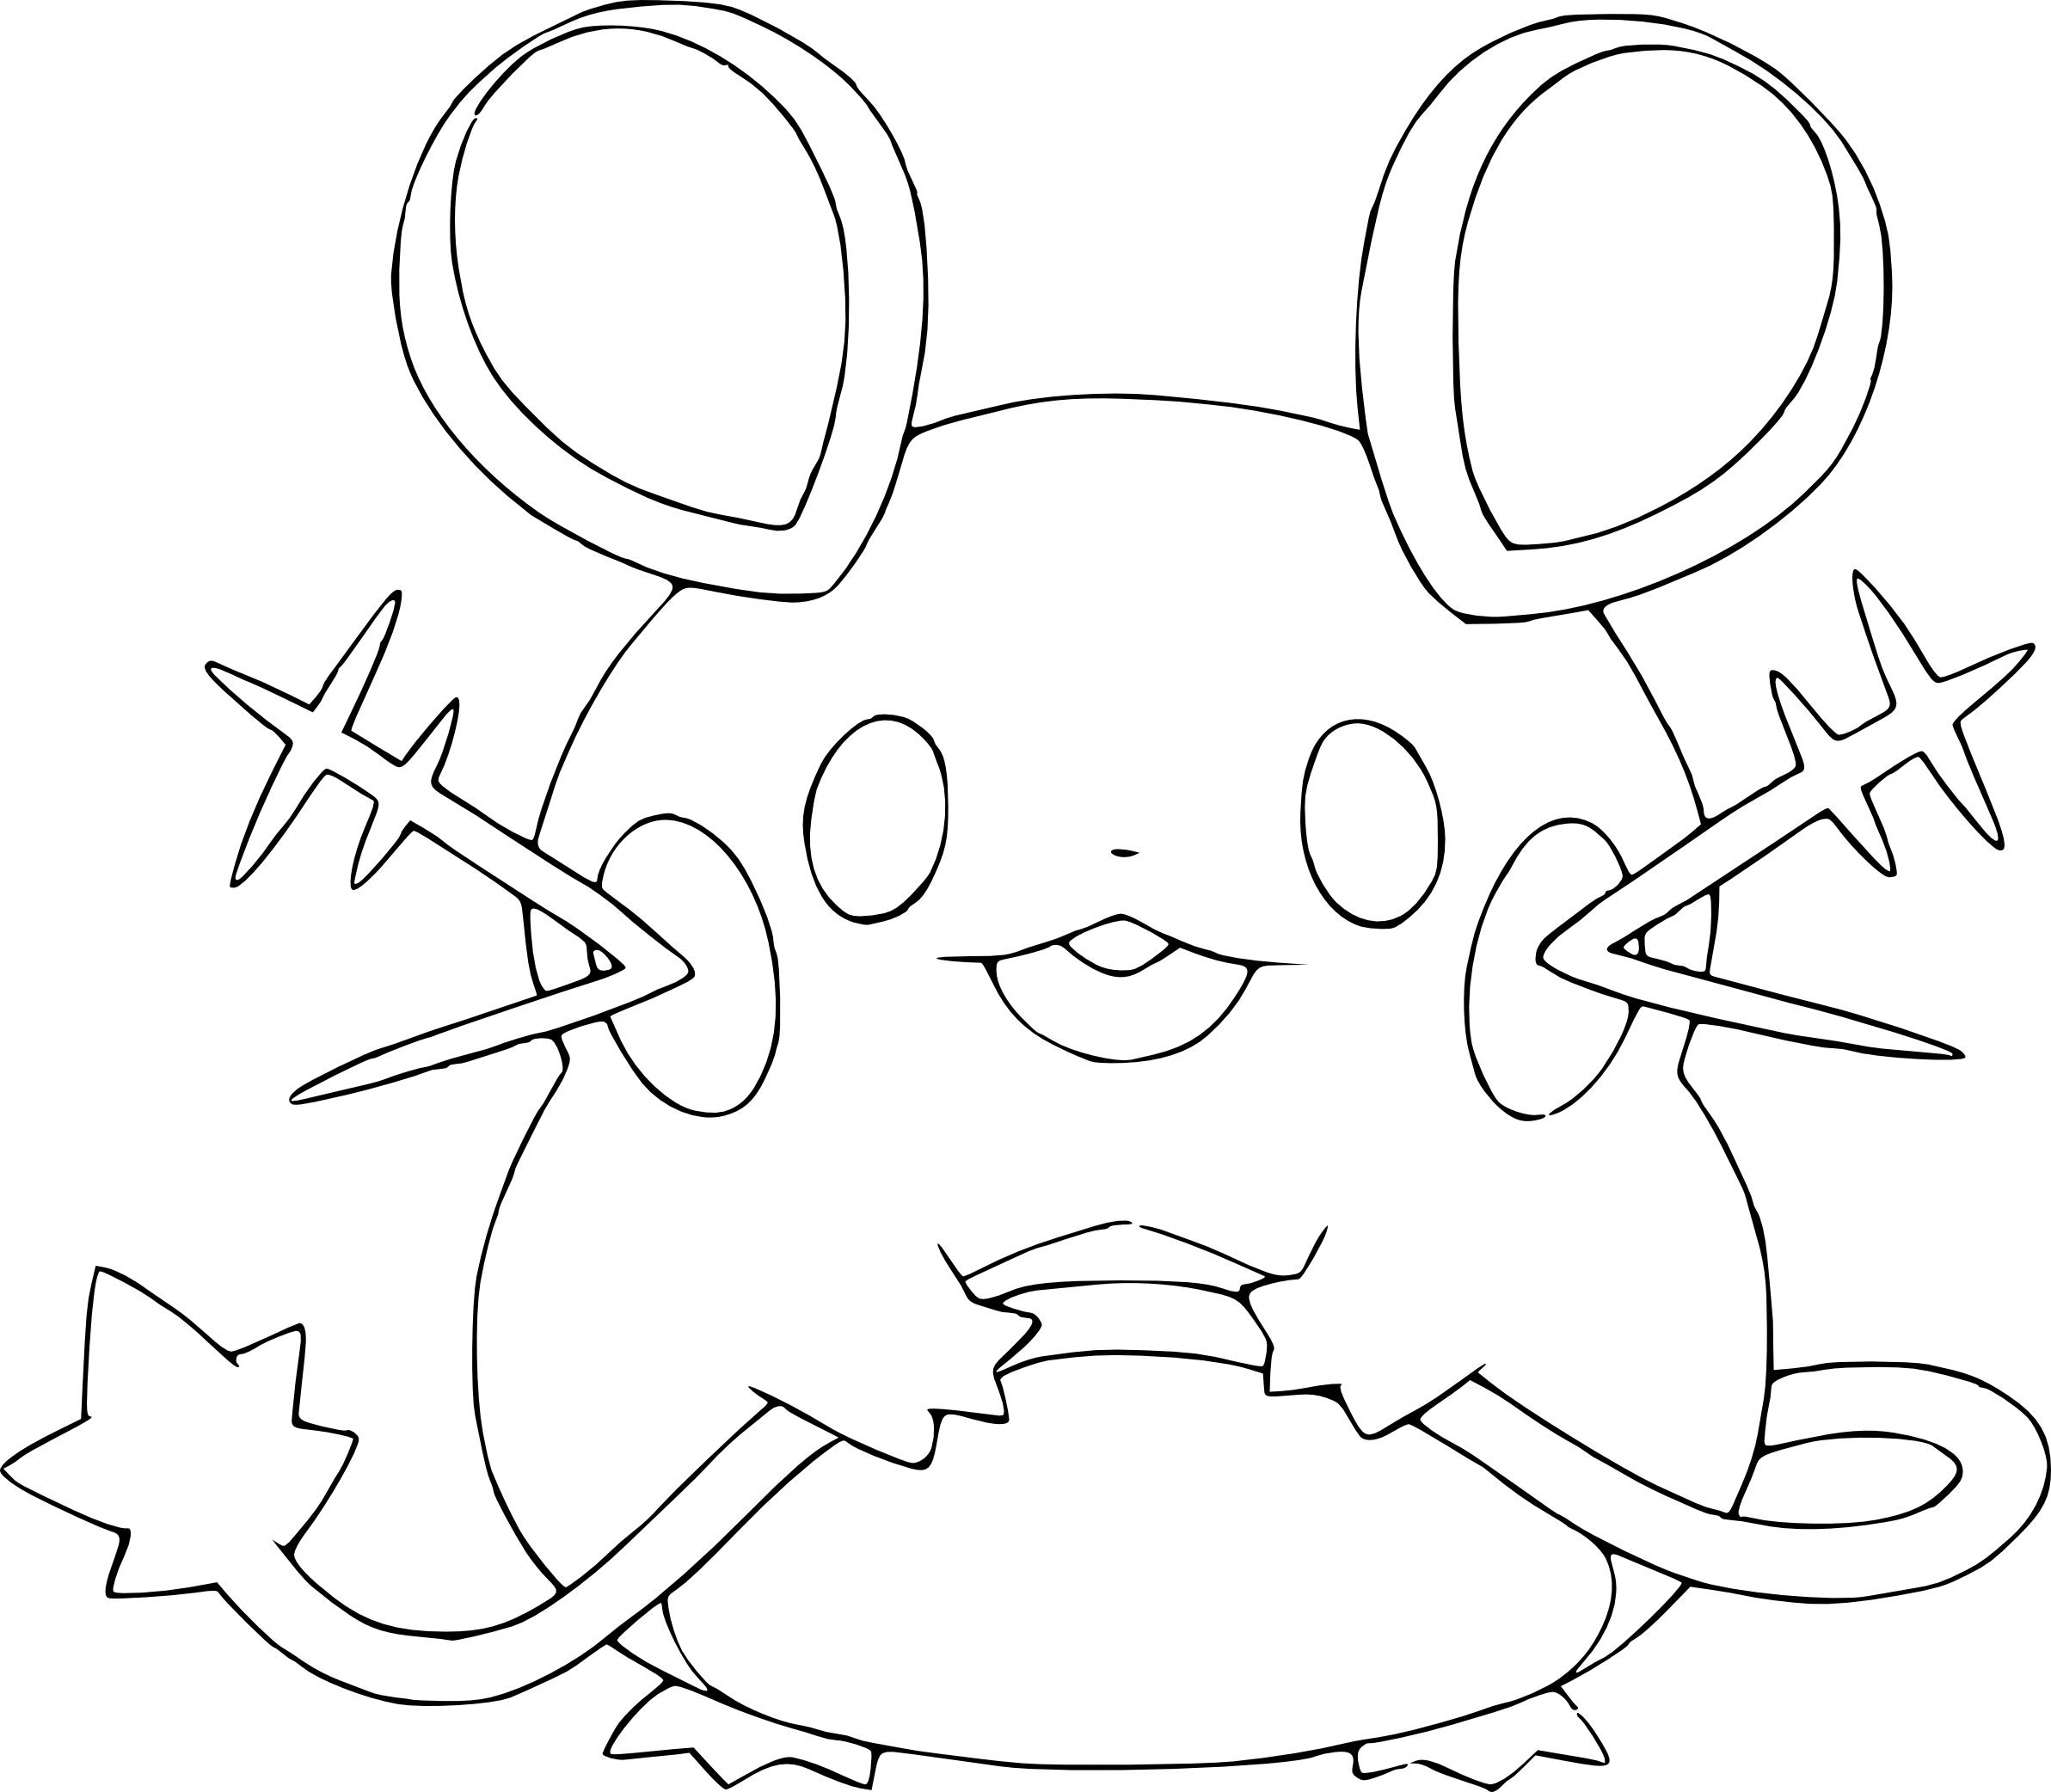 Beau Dessin A Imprimer Pokemon Zekrom